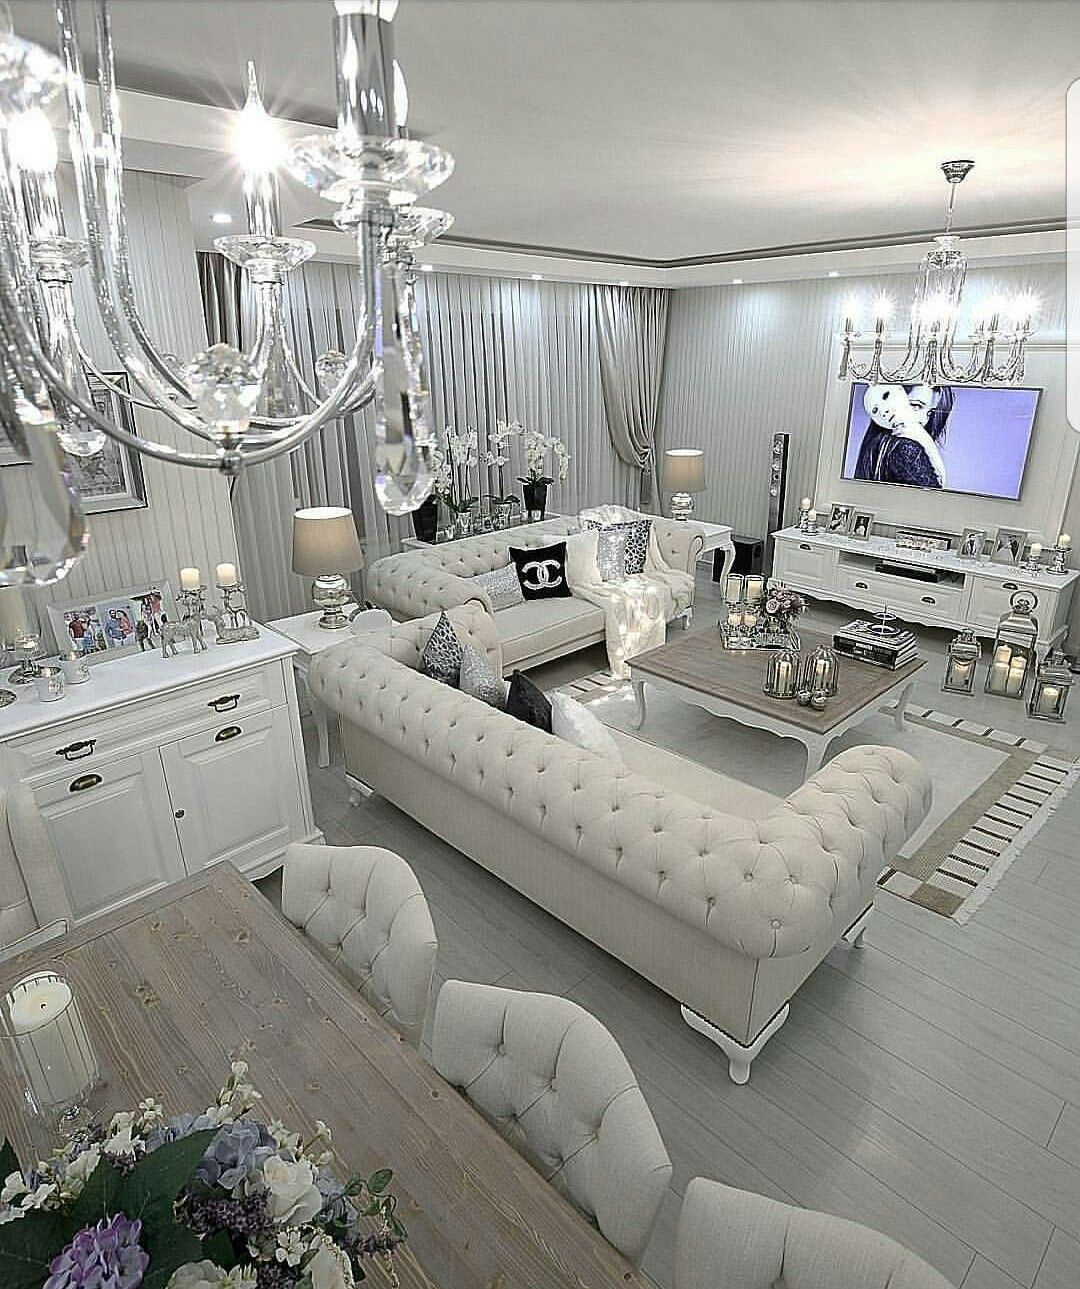 Living rooms | remodel for bedrooms | Pinterest | Living ...